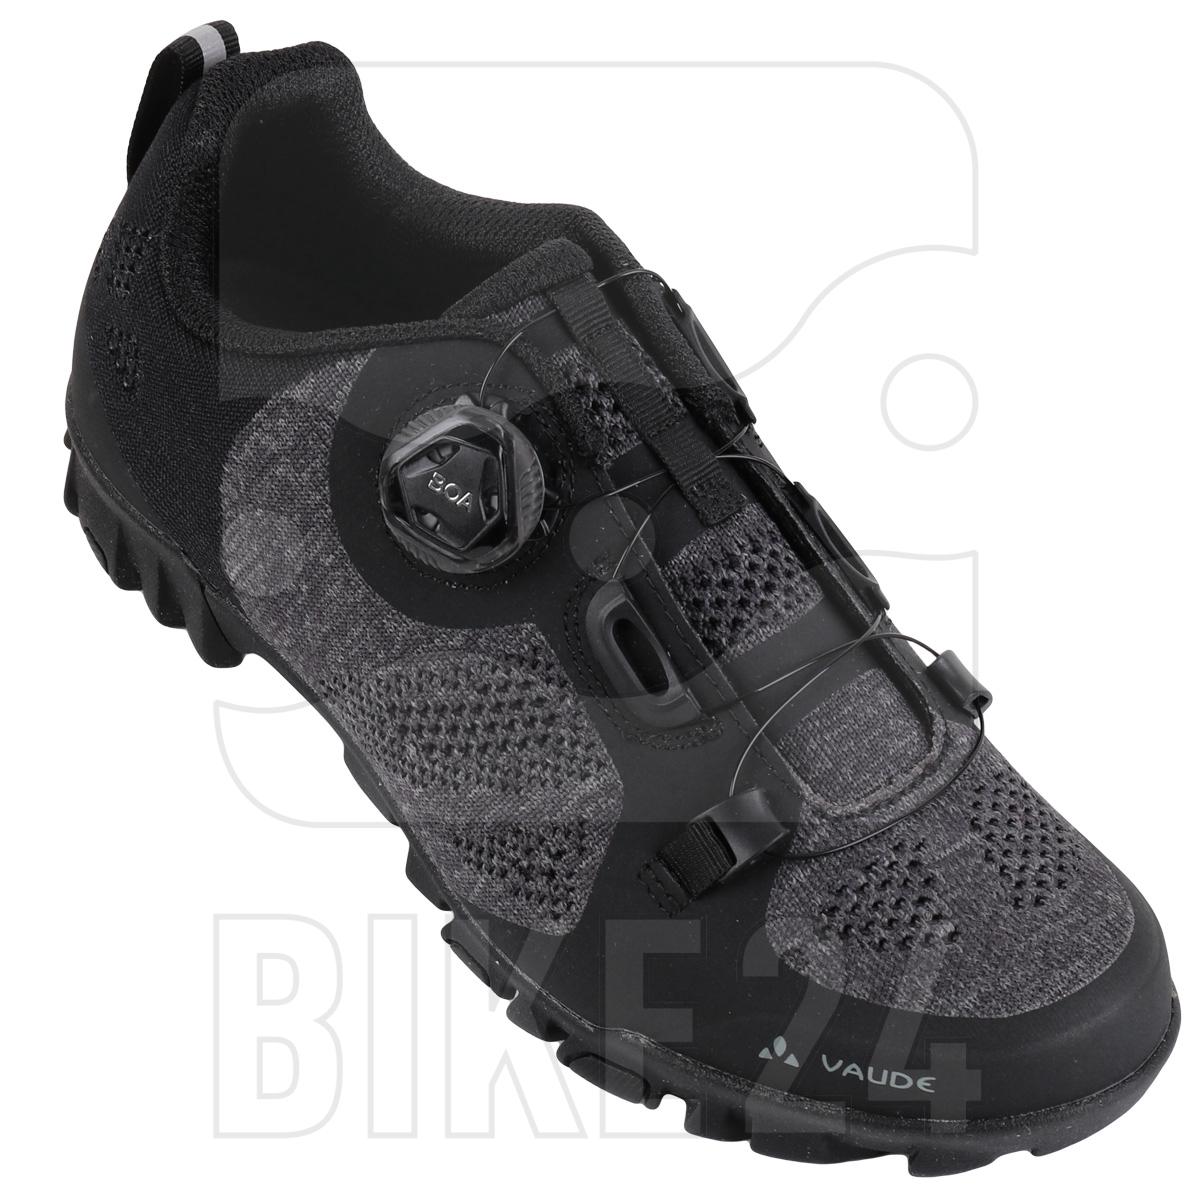 Vaude Women's TVL Skoj Shoes - black